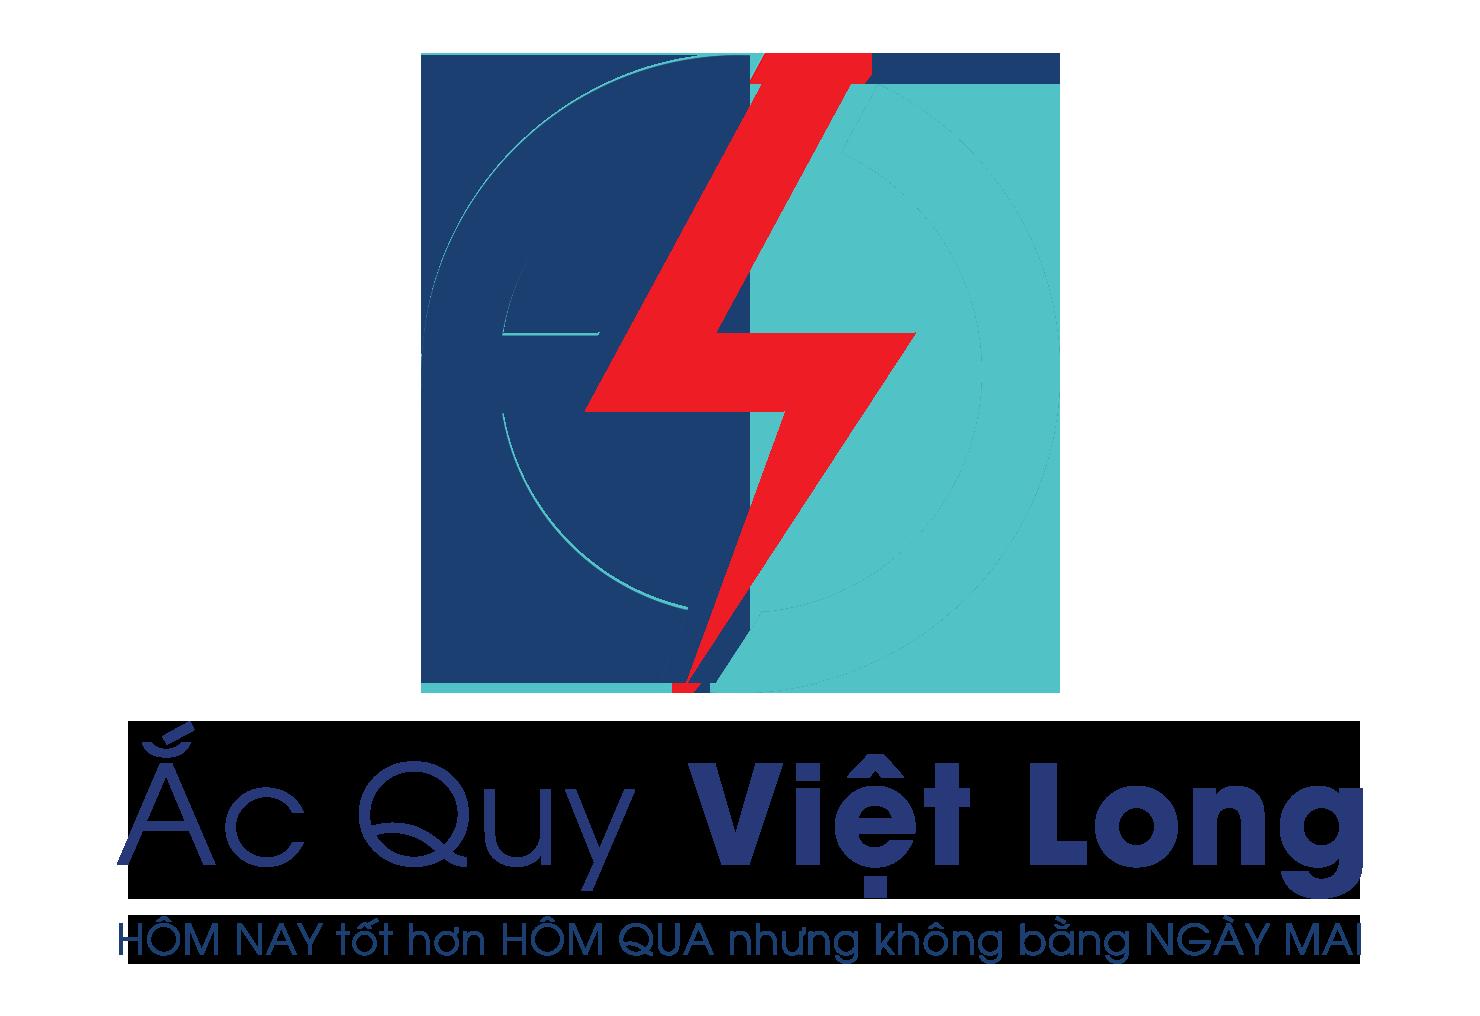 Ắc Quy Việt Long